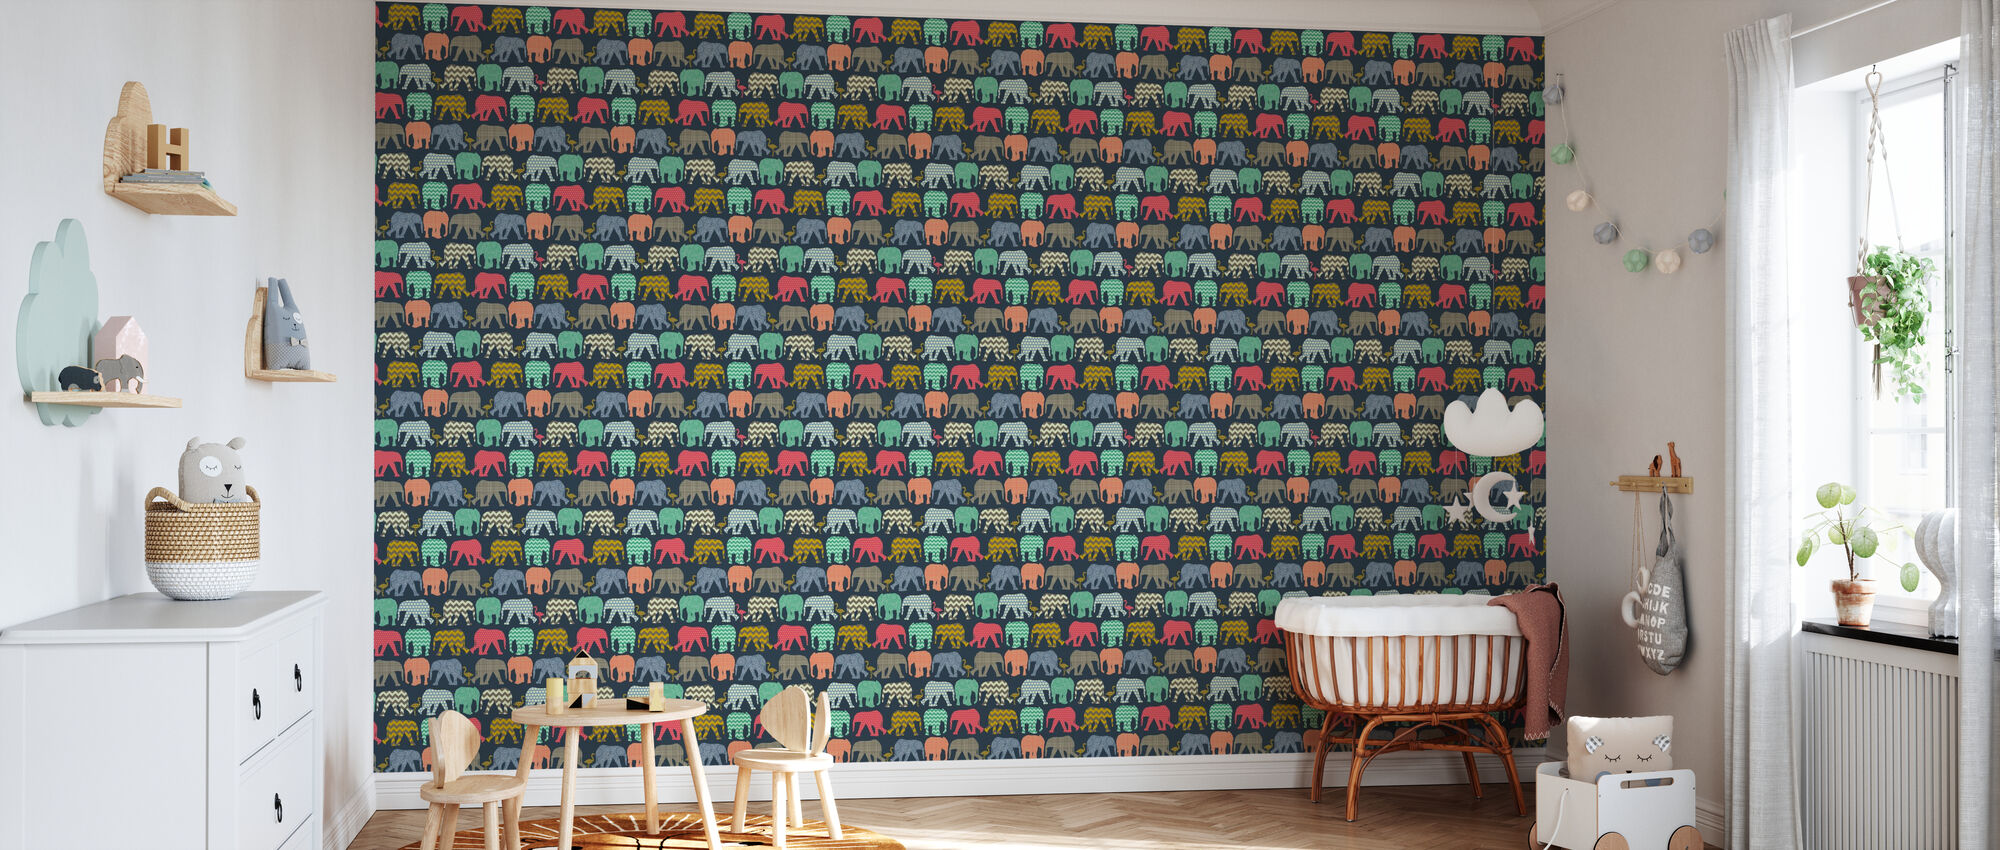 Baby Elephants and Flamingos 1 - Wallpaper - Nursery